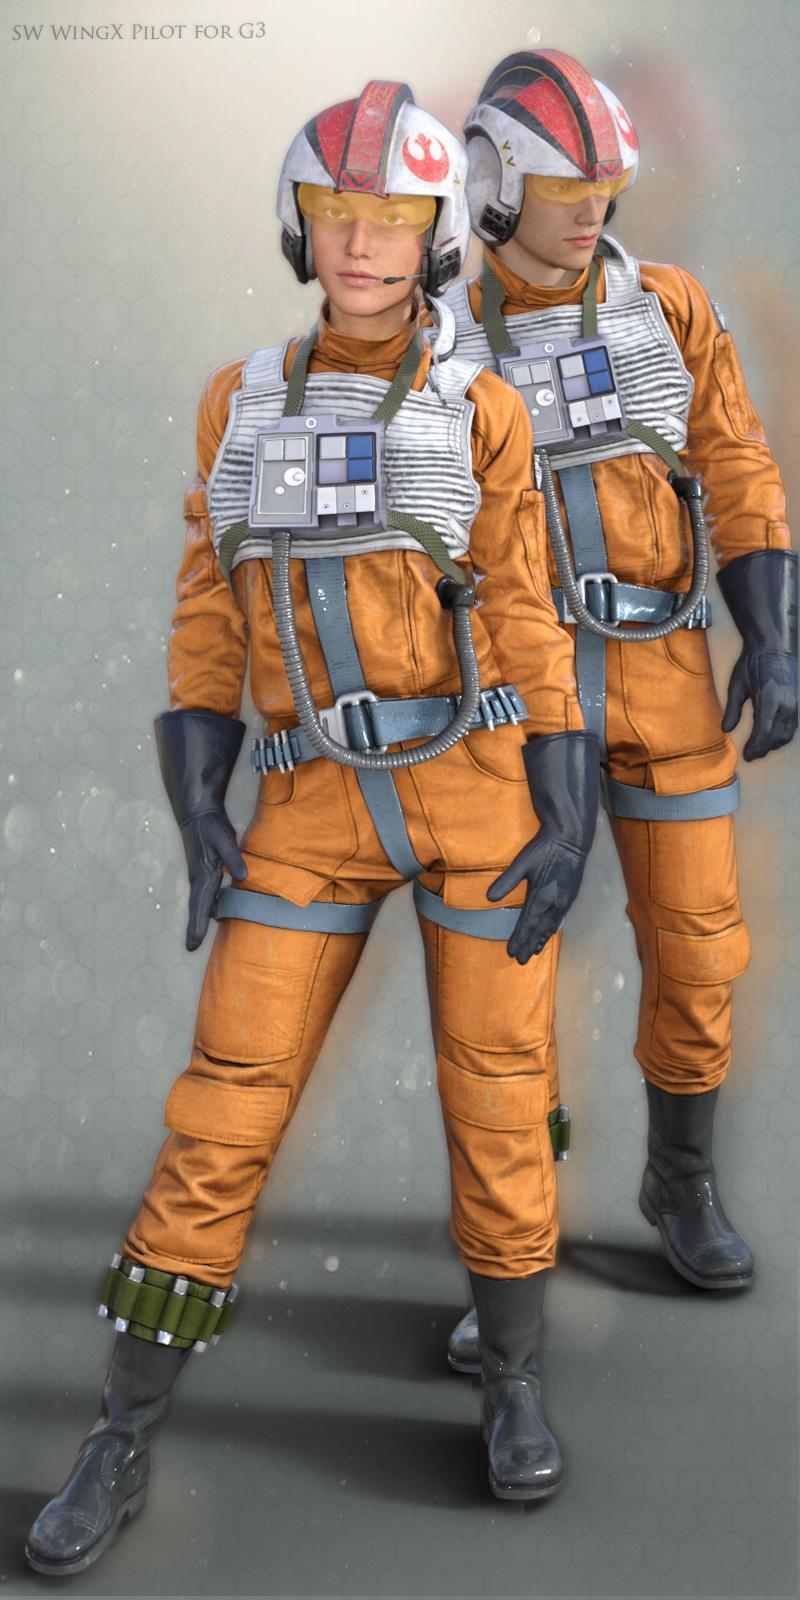 SW WingX Pilot for G3